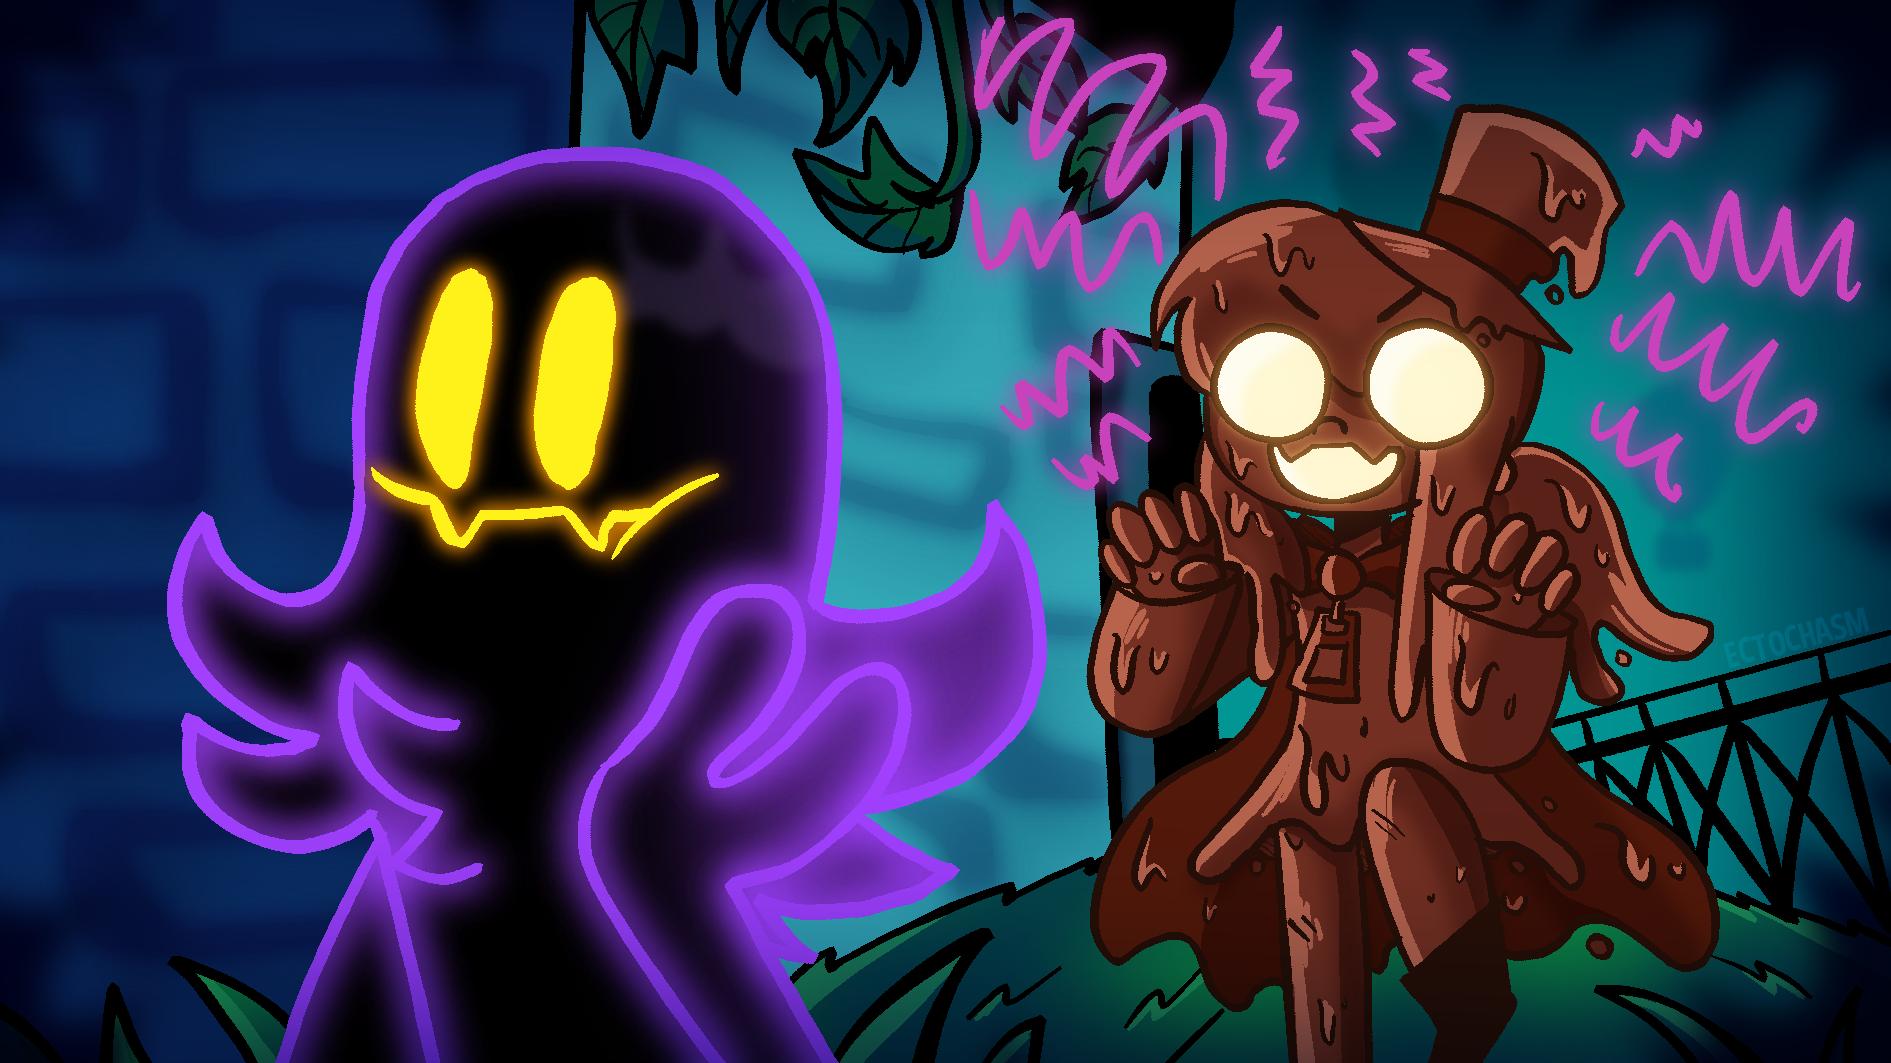 spooky scary space kids ??!